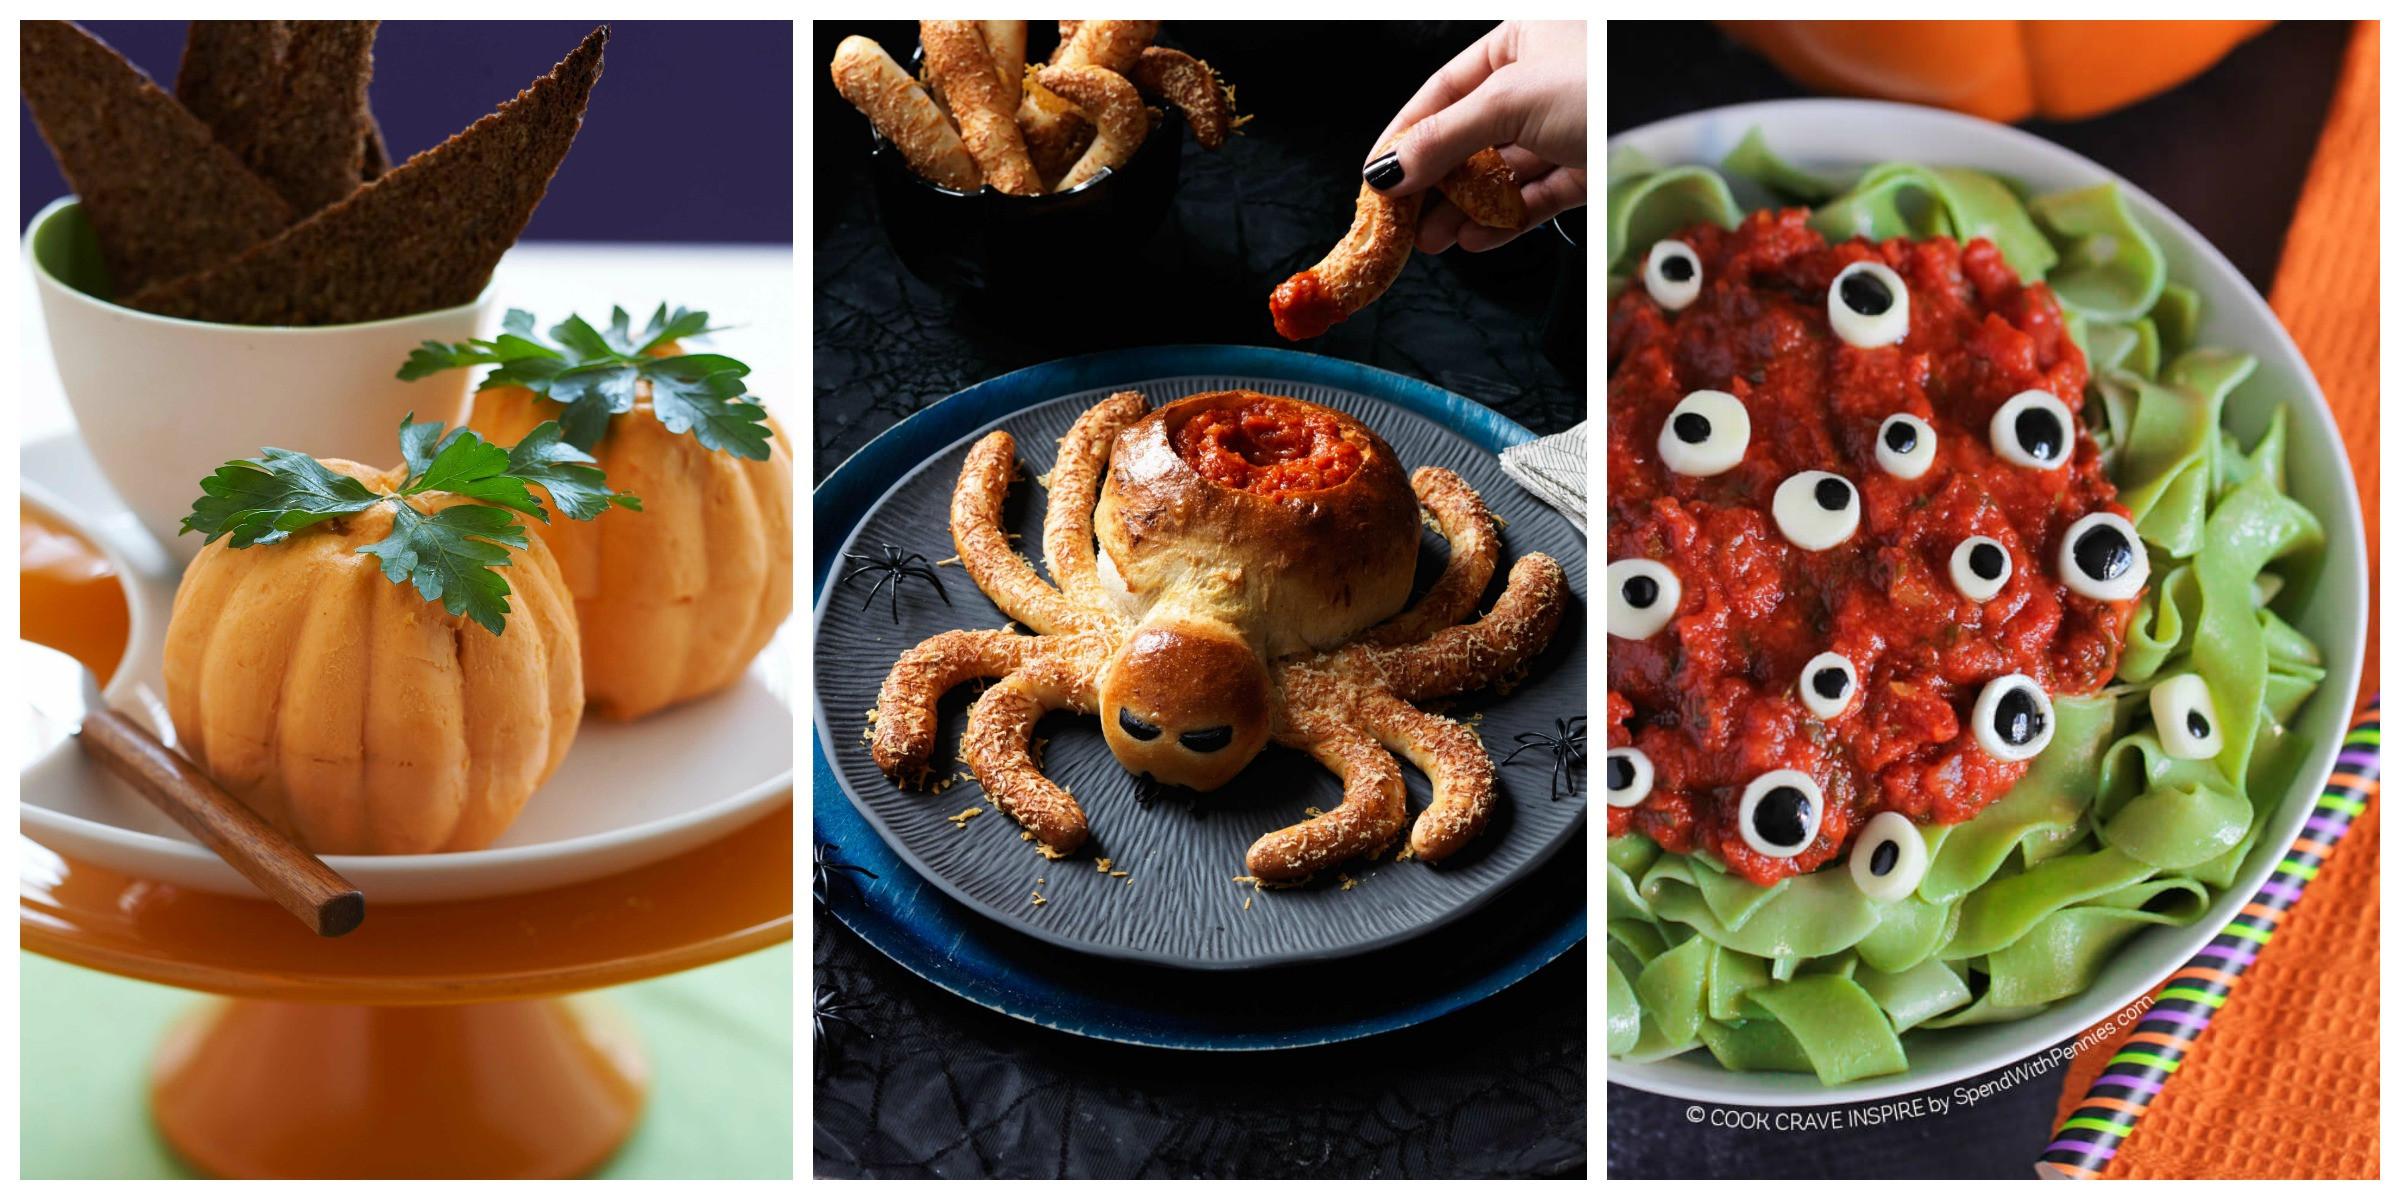 Easy Halloween Dinners  25 Spooky Halloween Dinner Ideas Best Recipes for